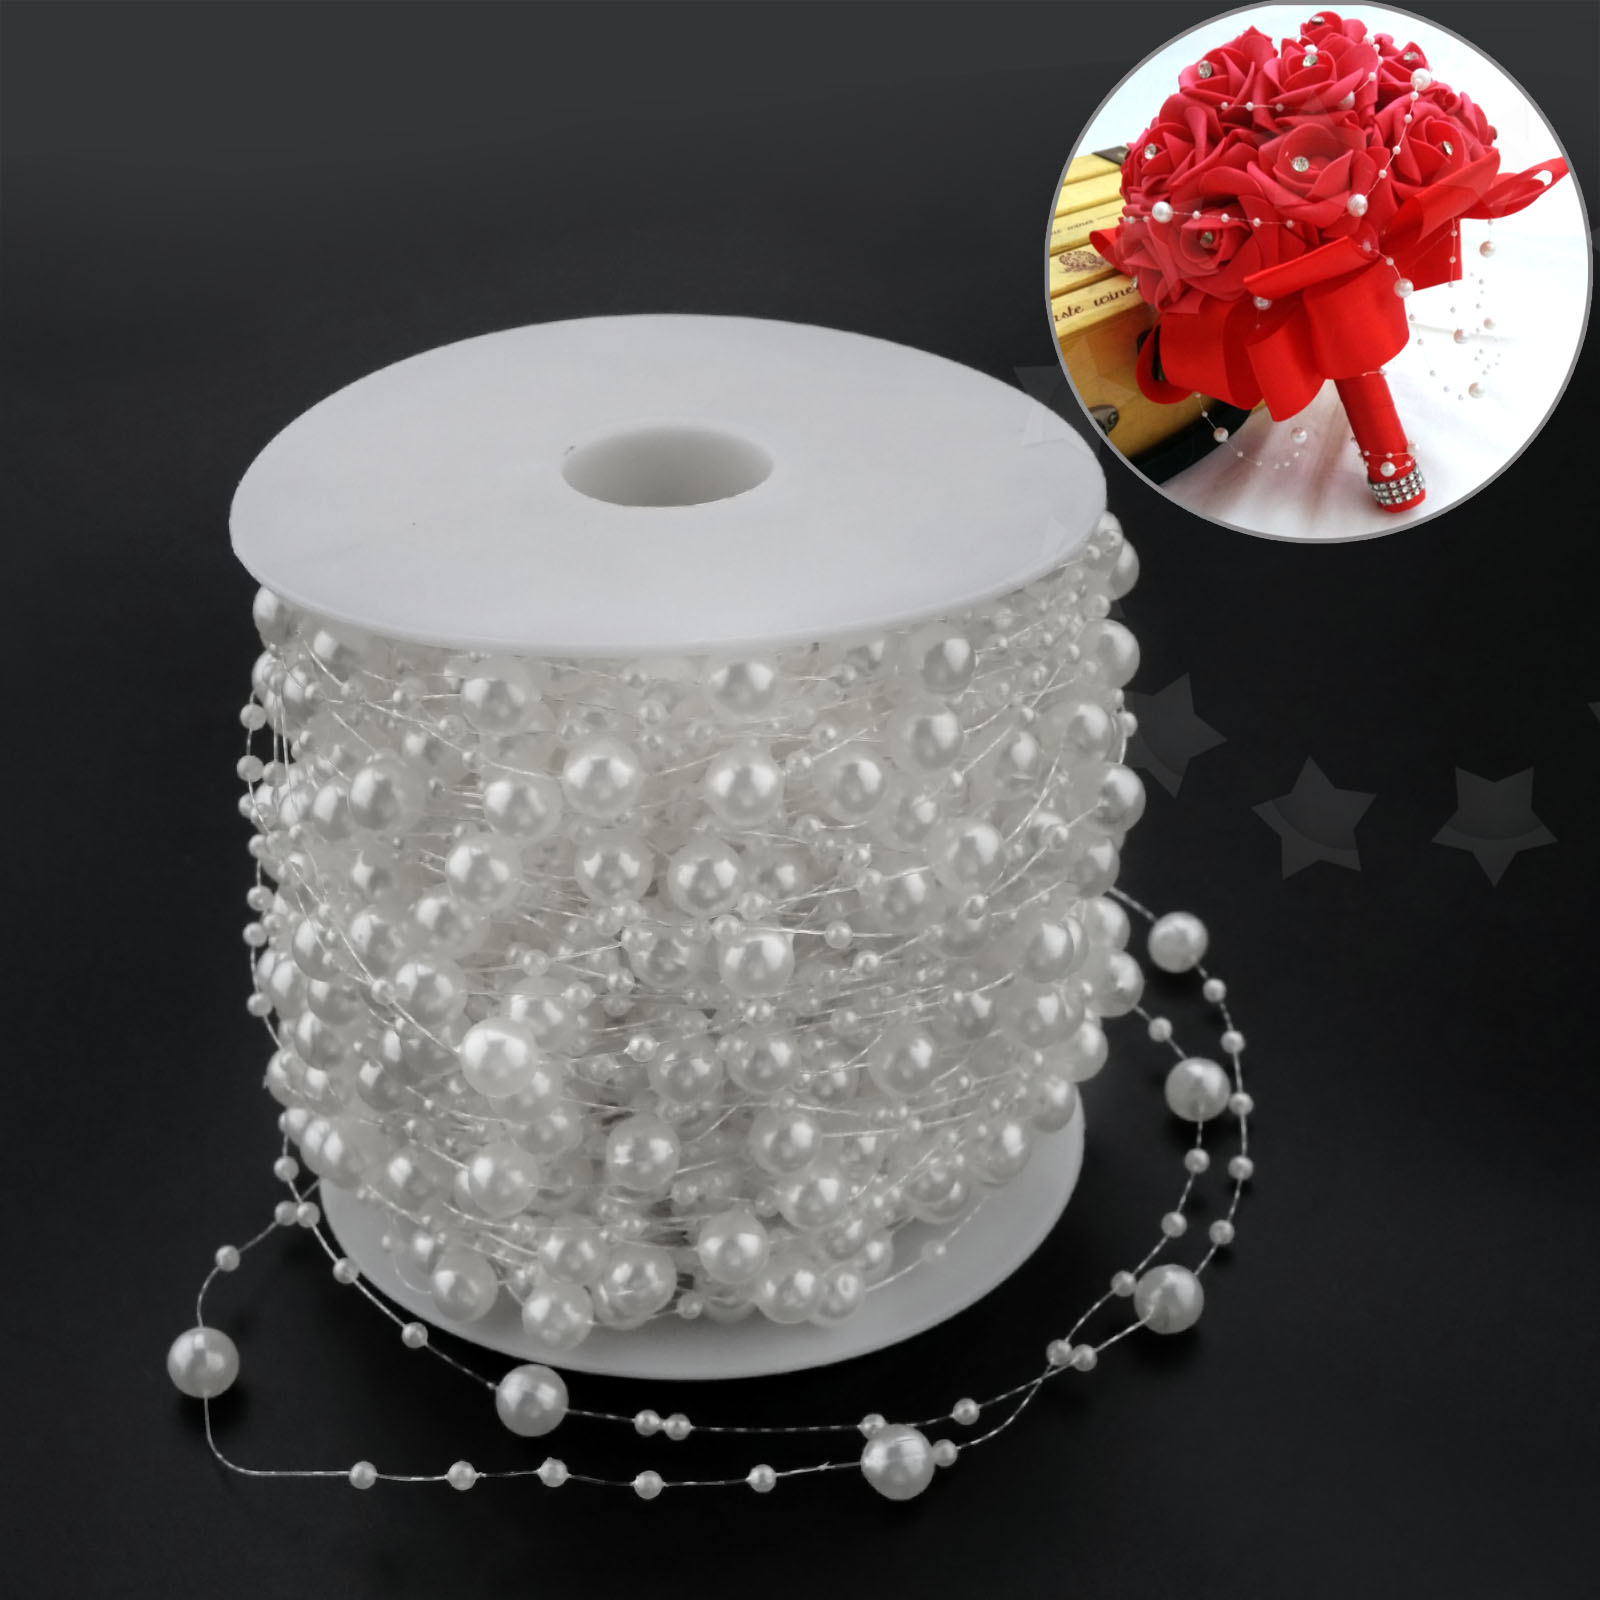 White Pearl Beads Strand Garland Acrylic Wedding Pearl: 60m ABS Acrylic White Pearl Bead String Bridal Party Xmas